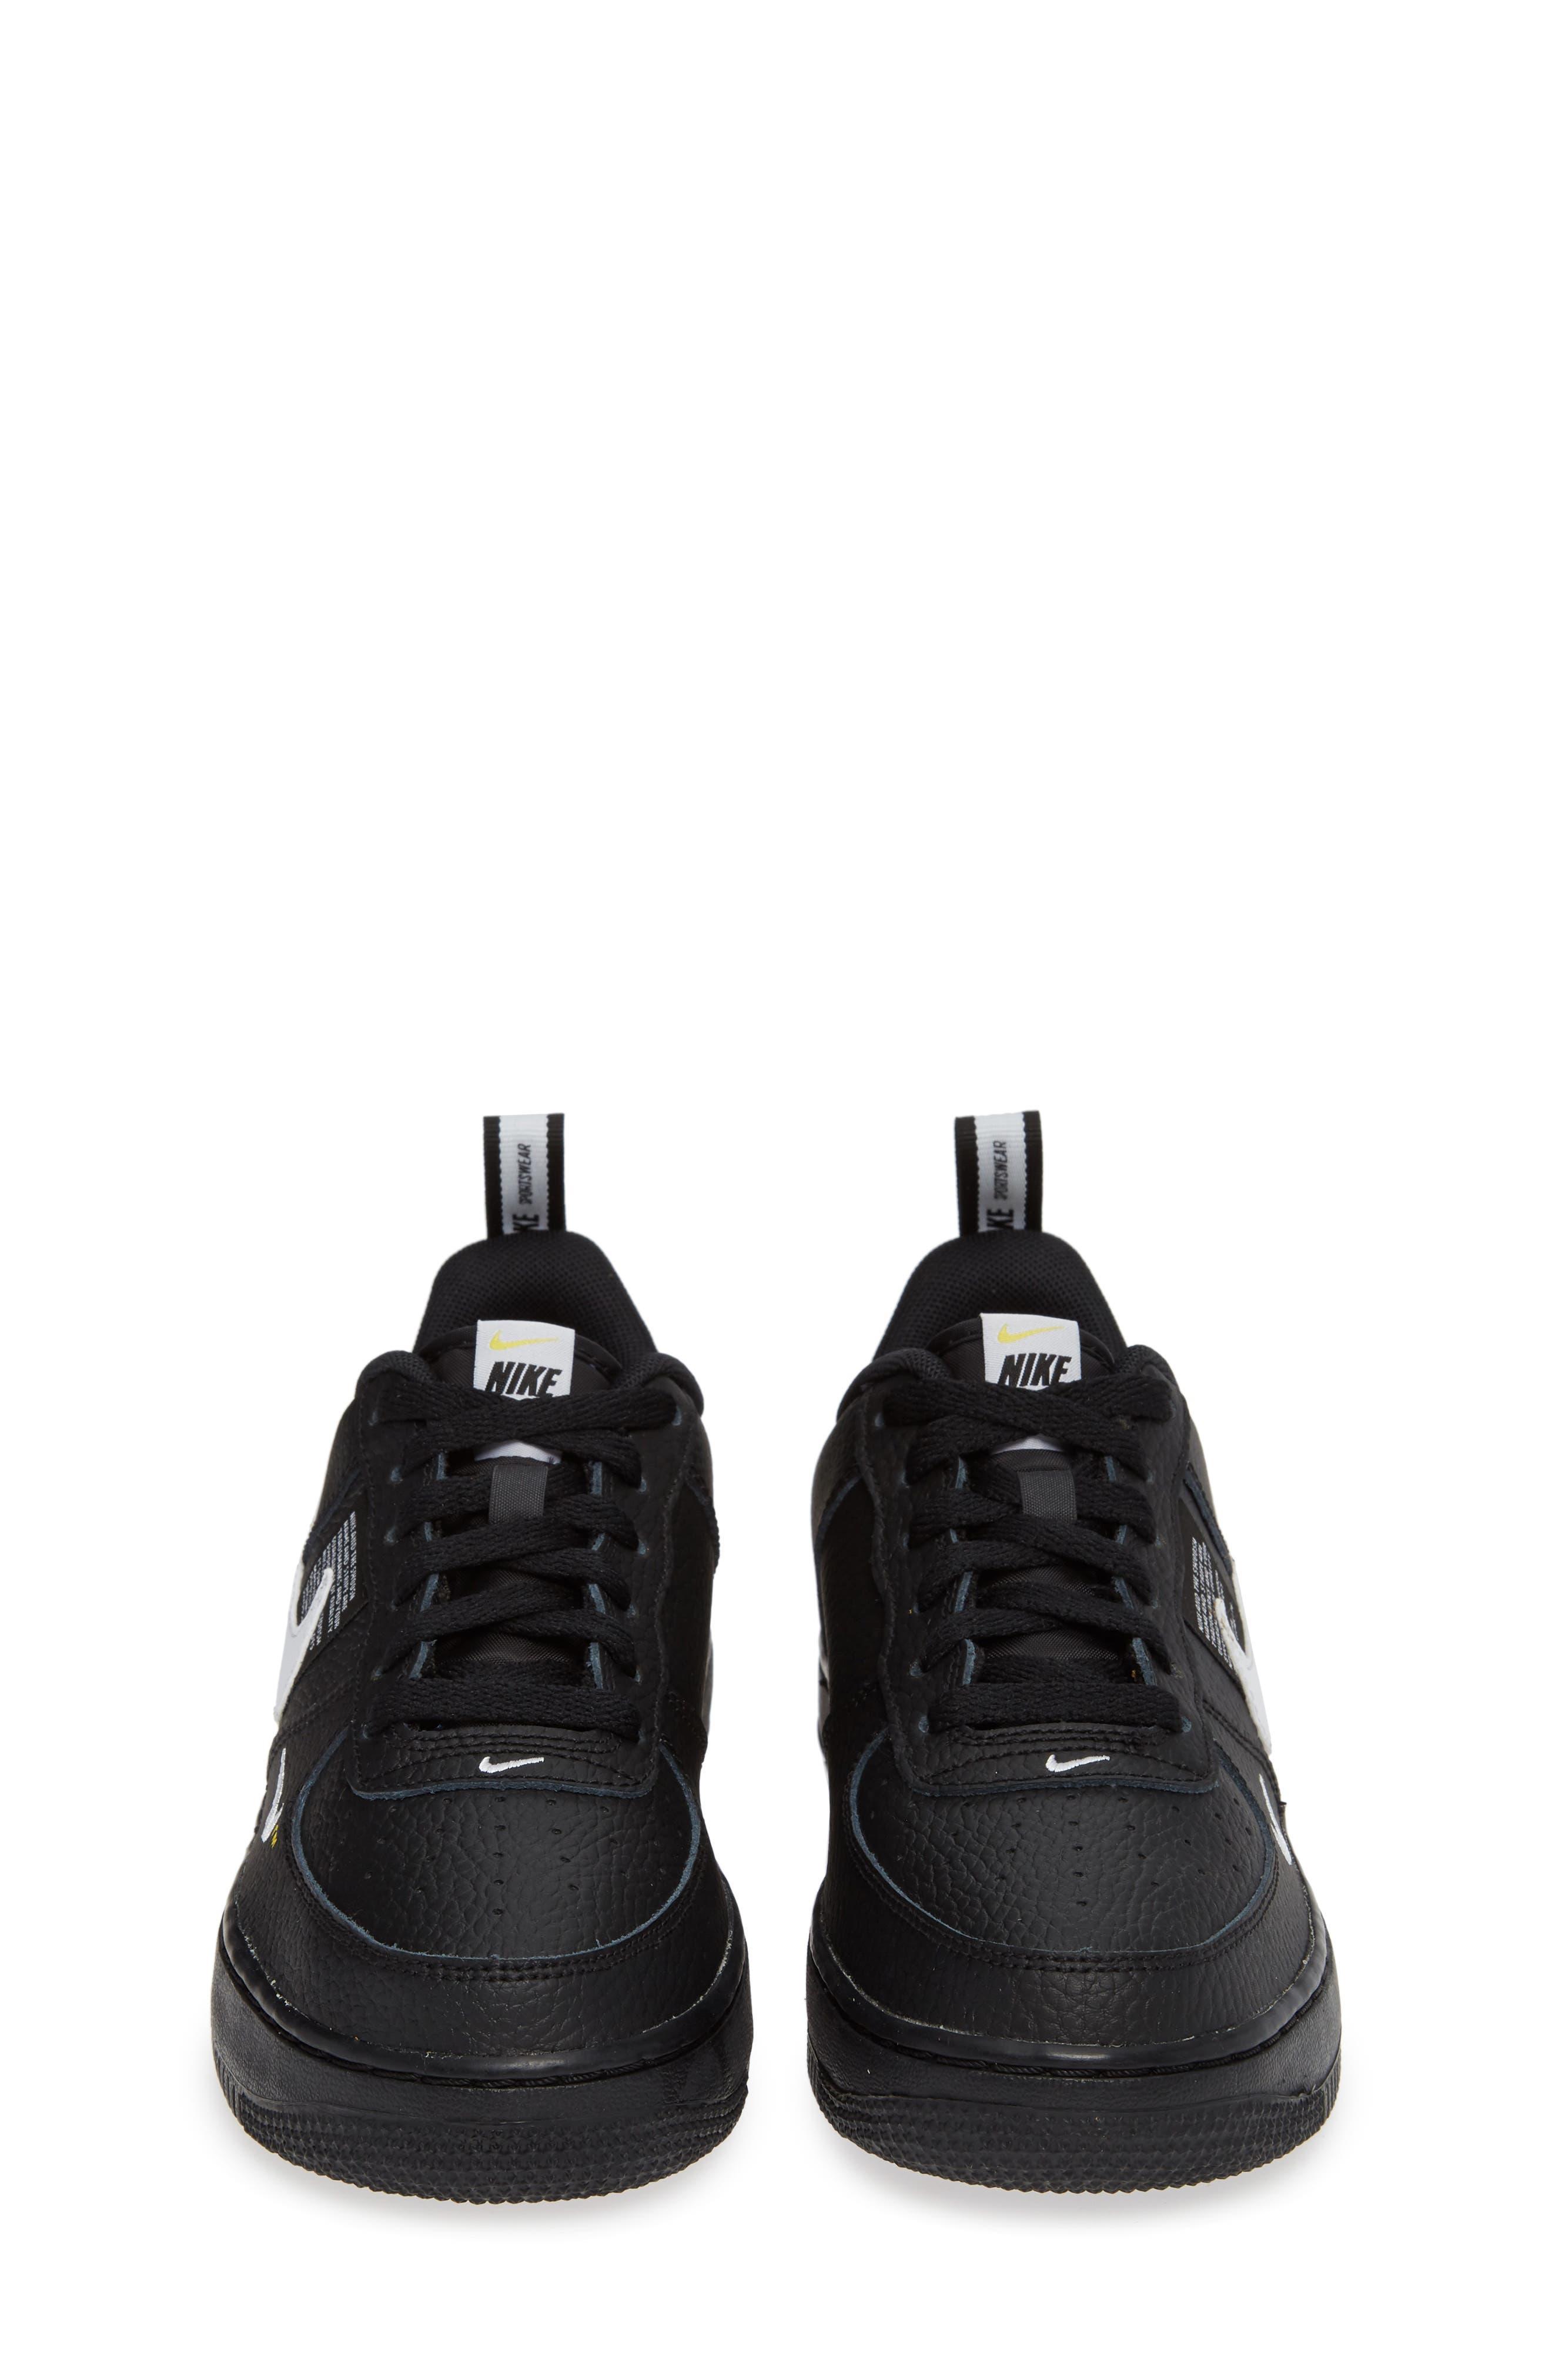 NIKE,                             Air Force 1 LV8 Sneaker,                             Alternate thumbnail 5, color,                             BLACK/ WHITE-BLACK-TOUR YELLOW